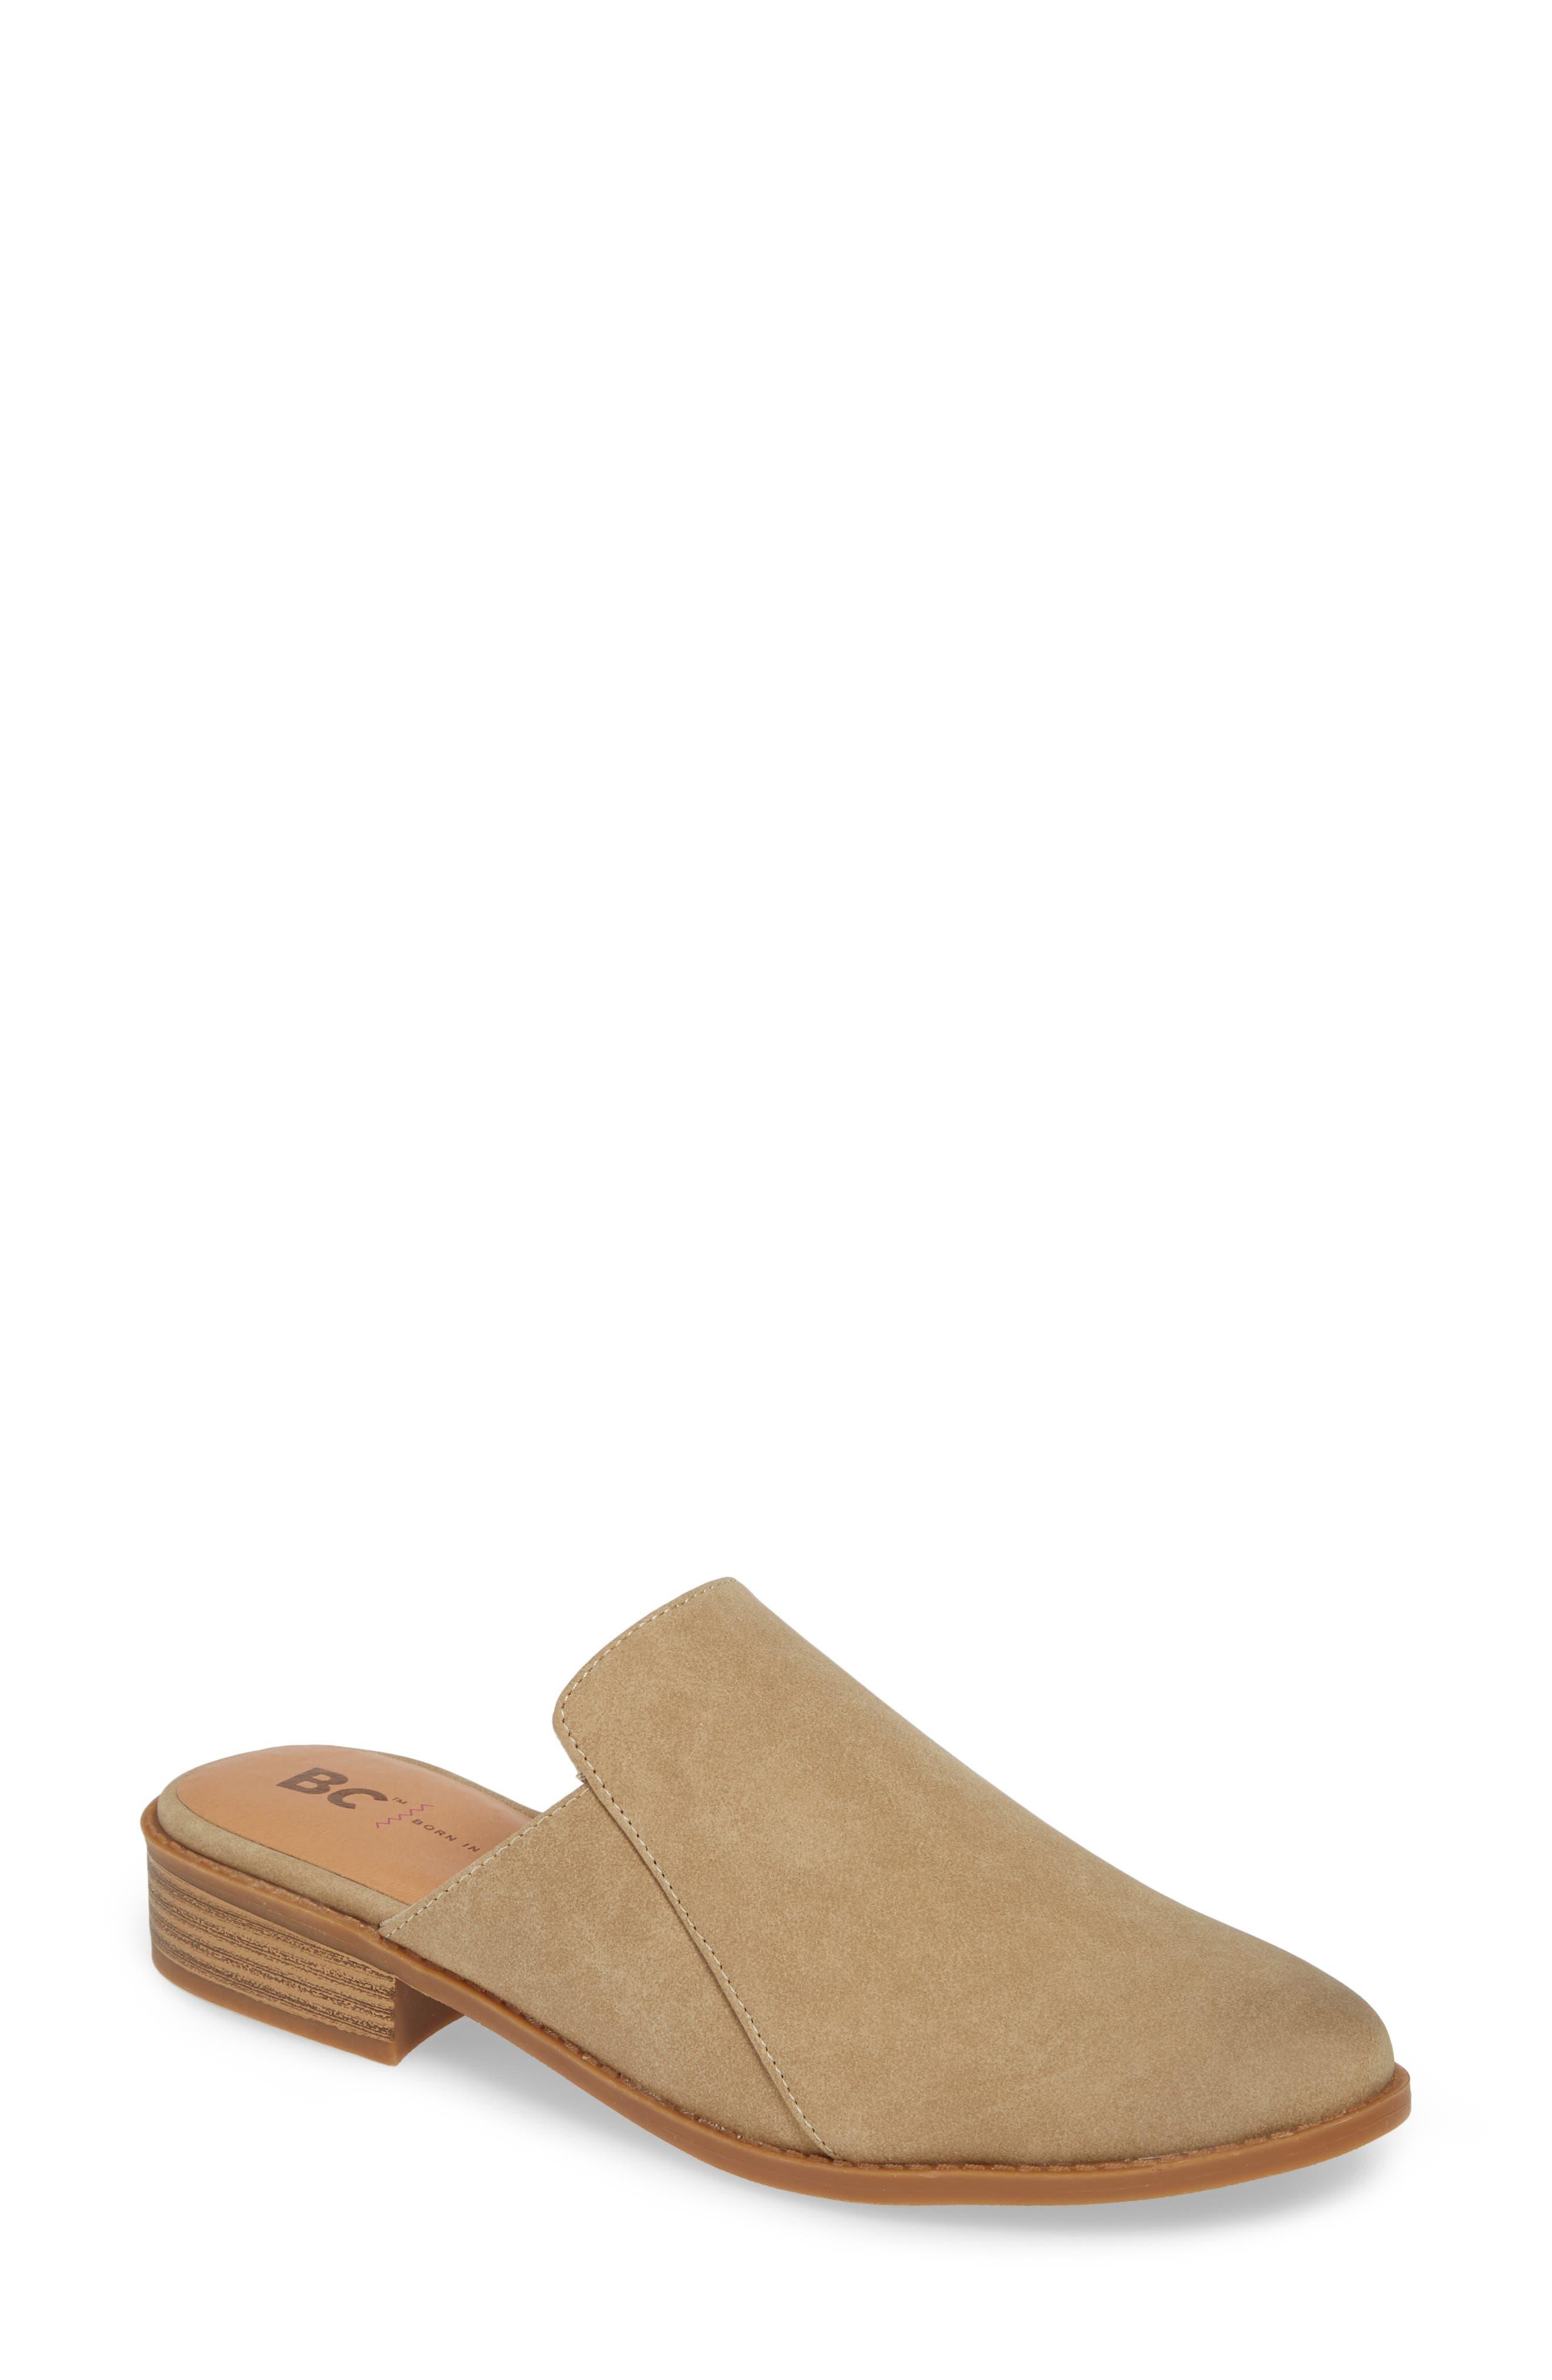 Bc Footwear Look At Me Vegan Mule, Brown